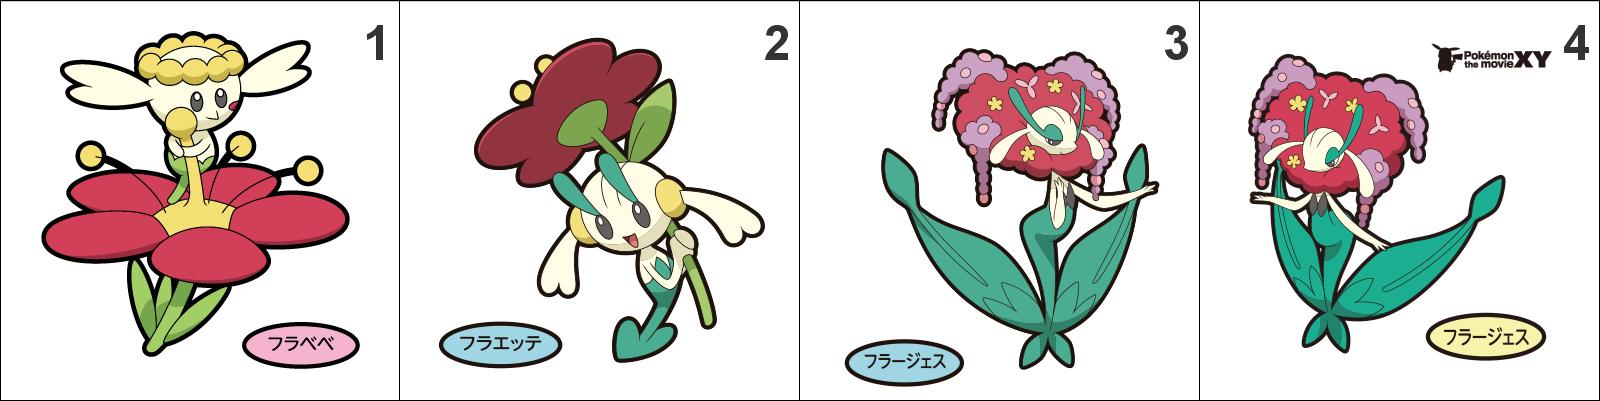 flabebe pokemon go - 1600×401